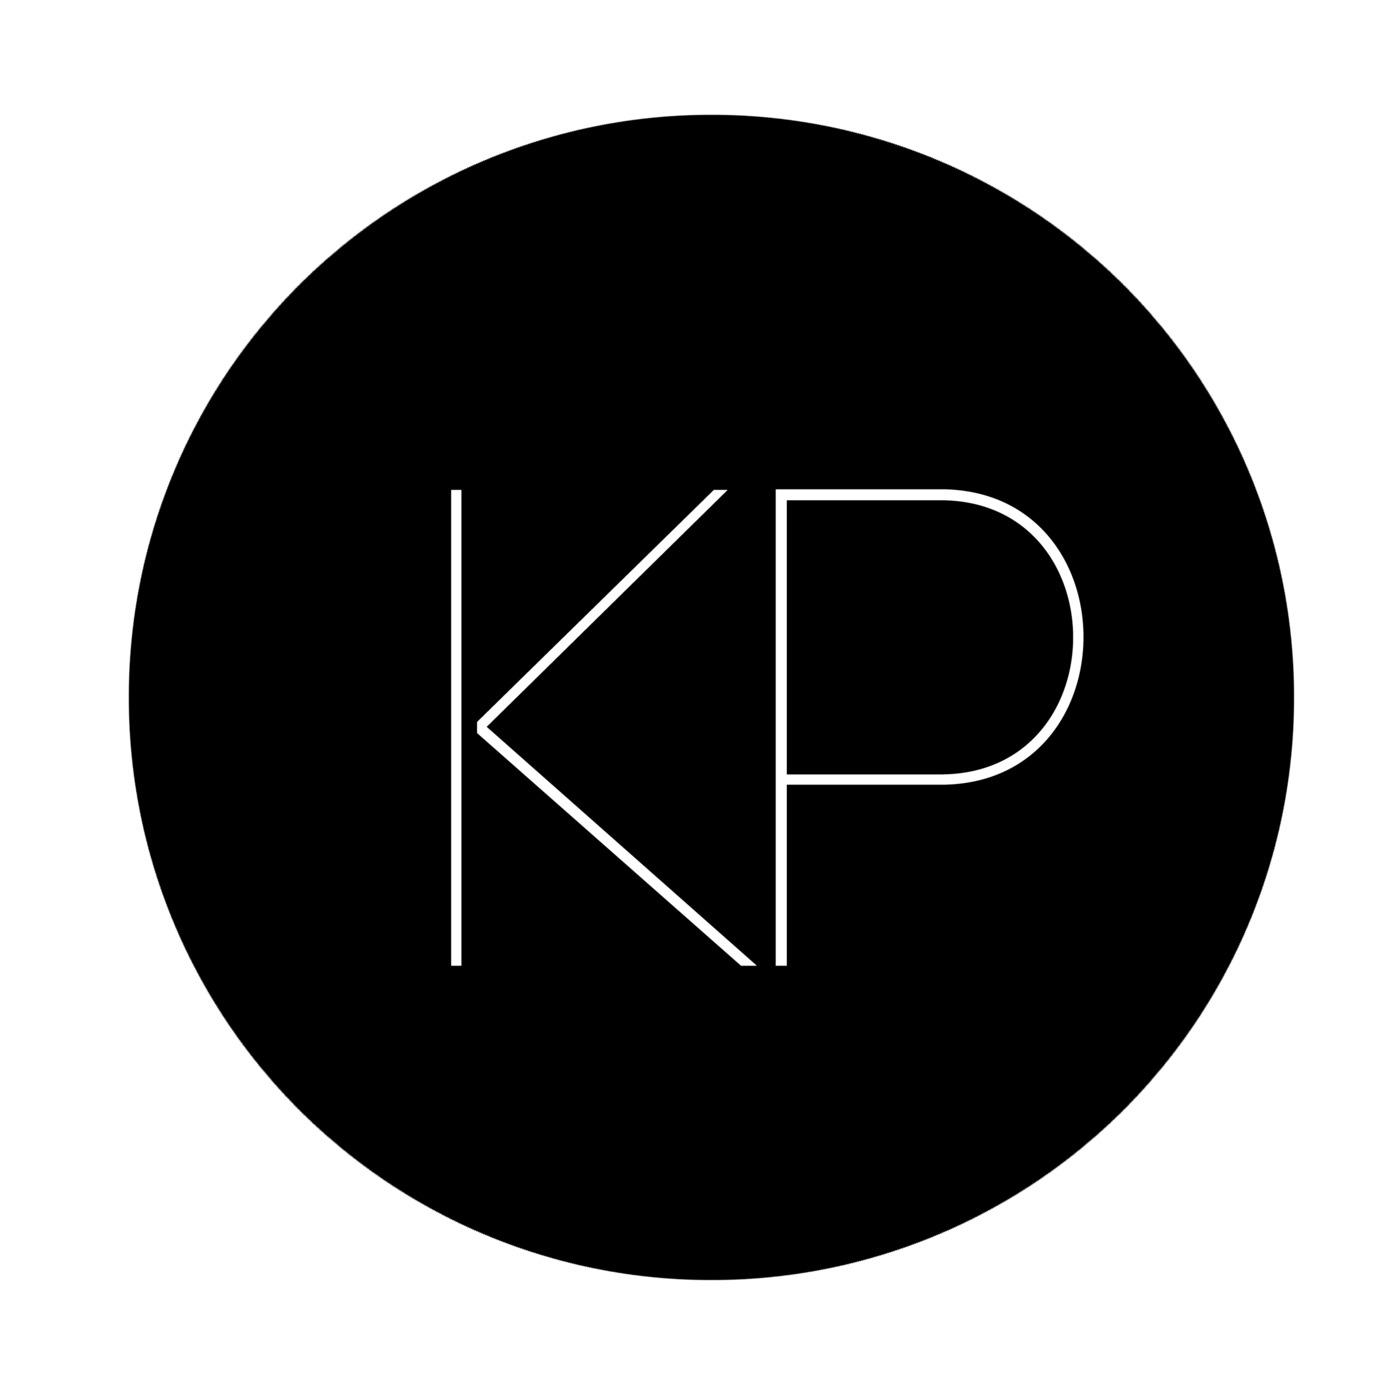 KOXI Planet's Podcast